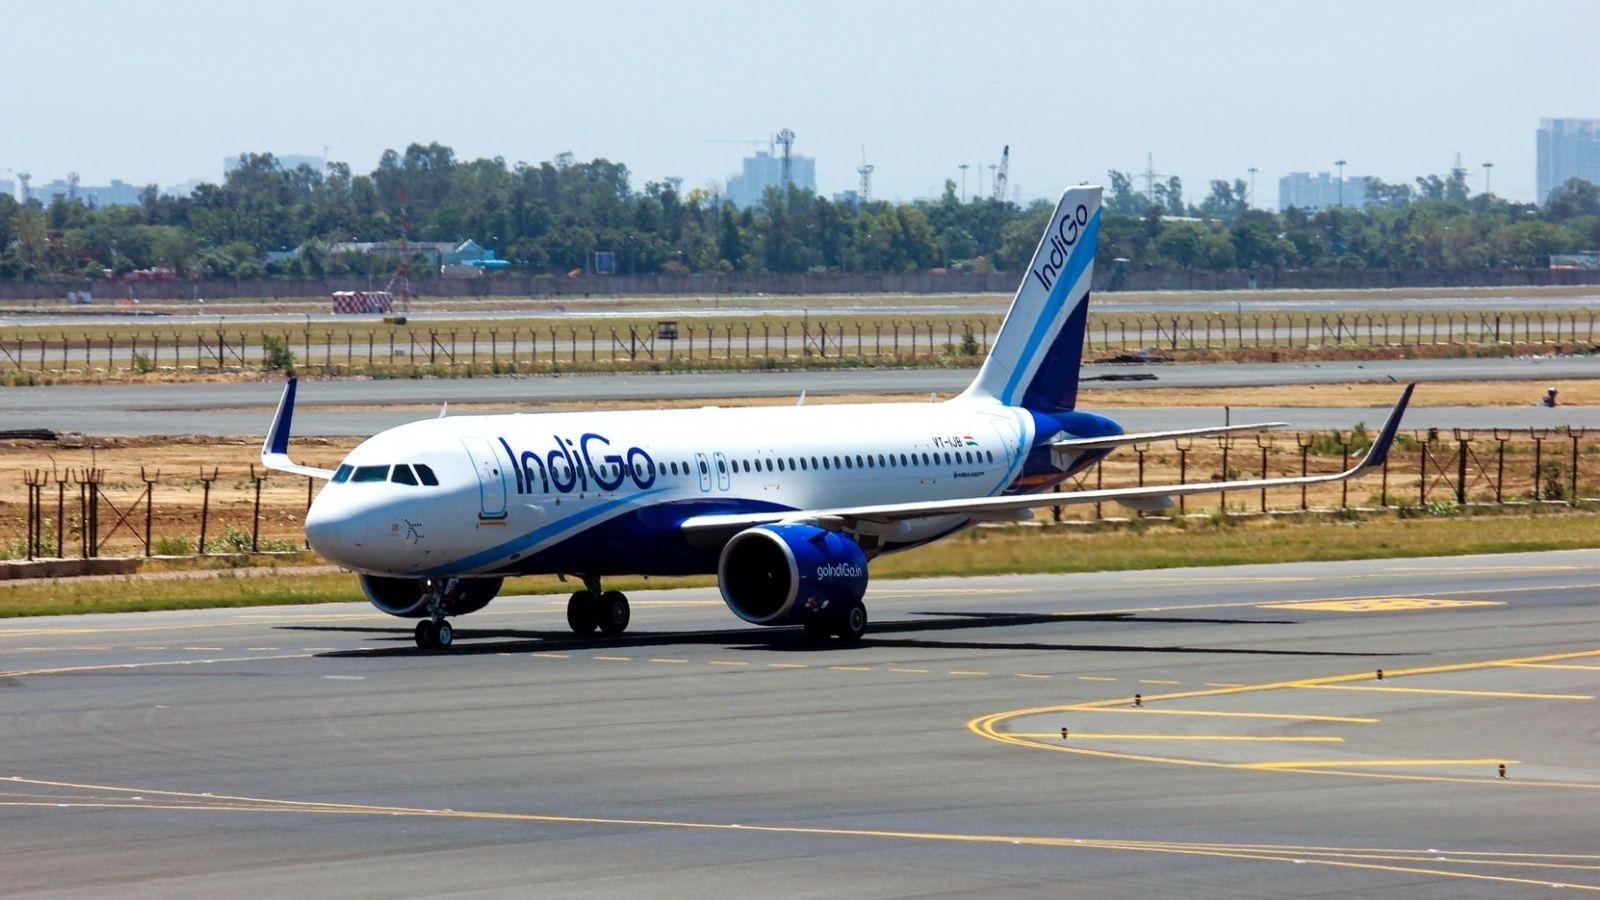 Indigo Airplane On Runway